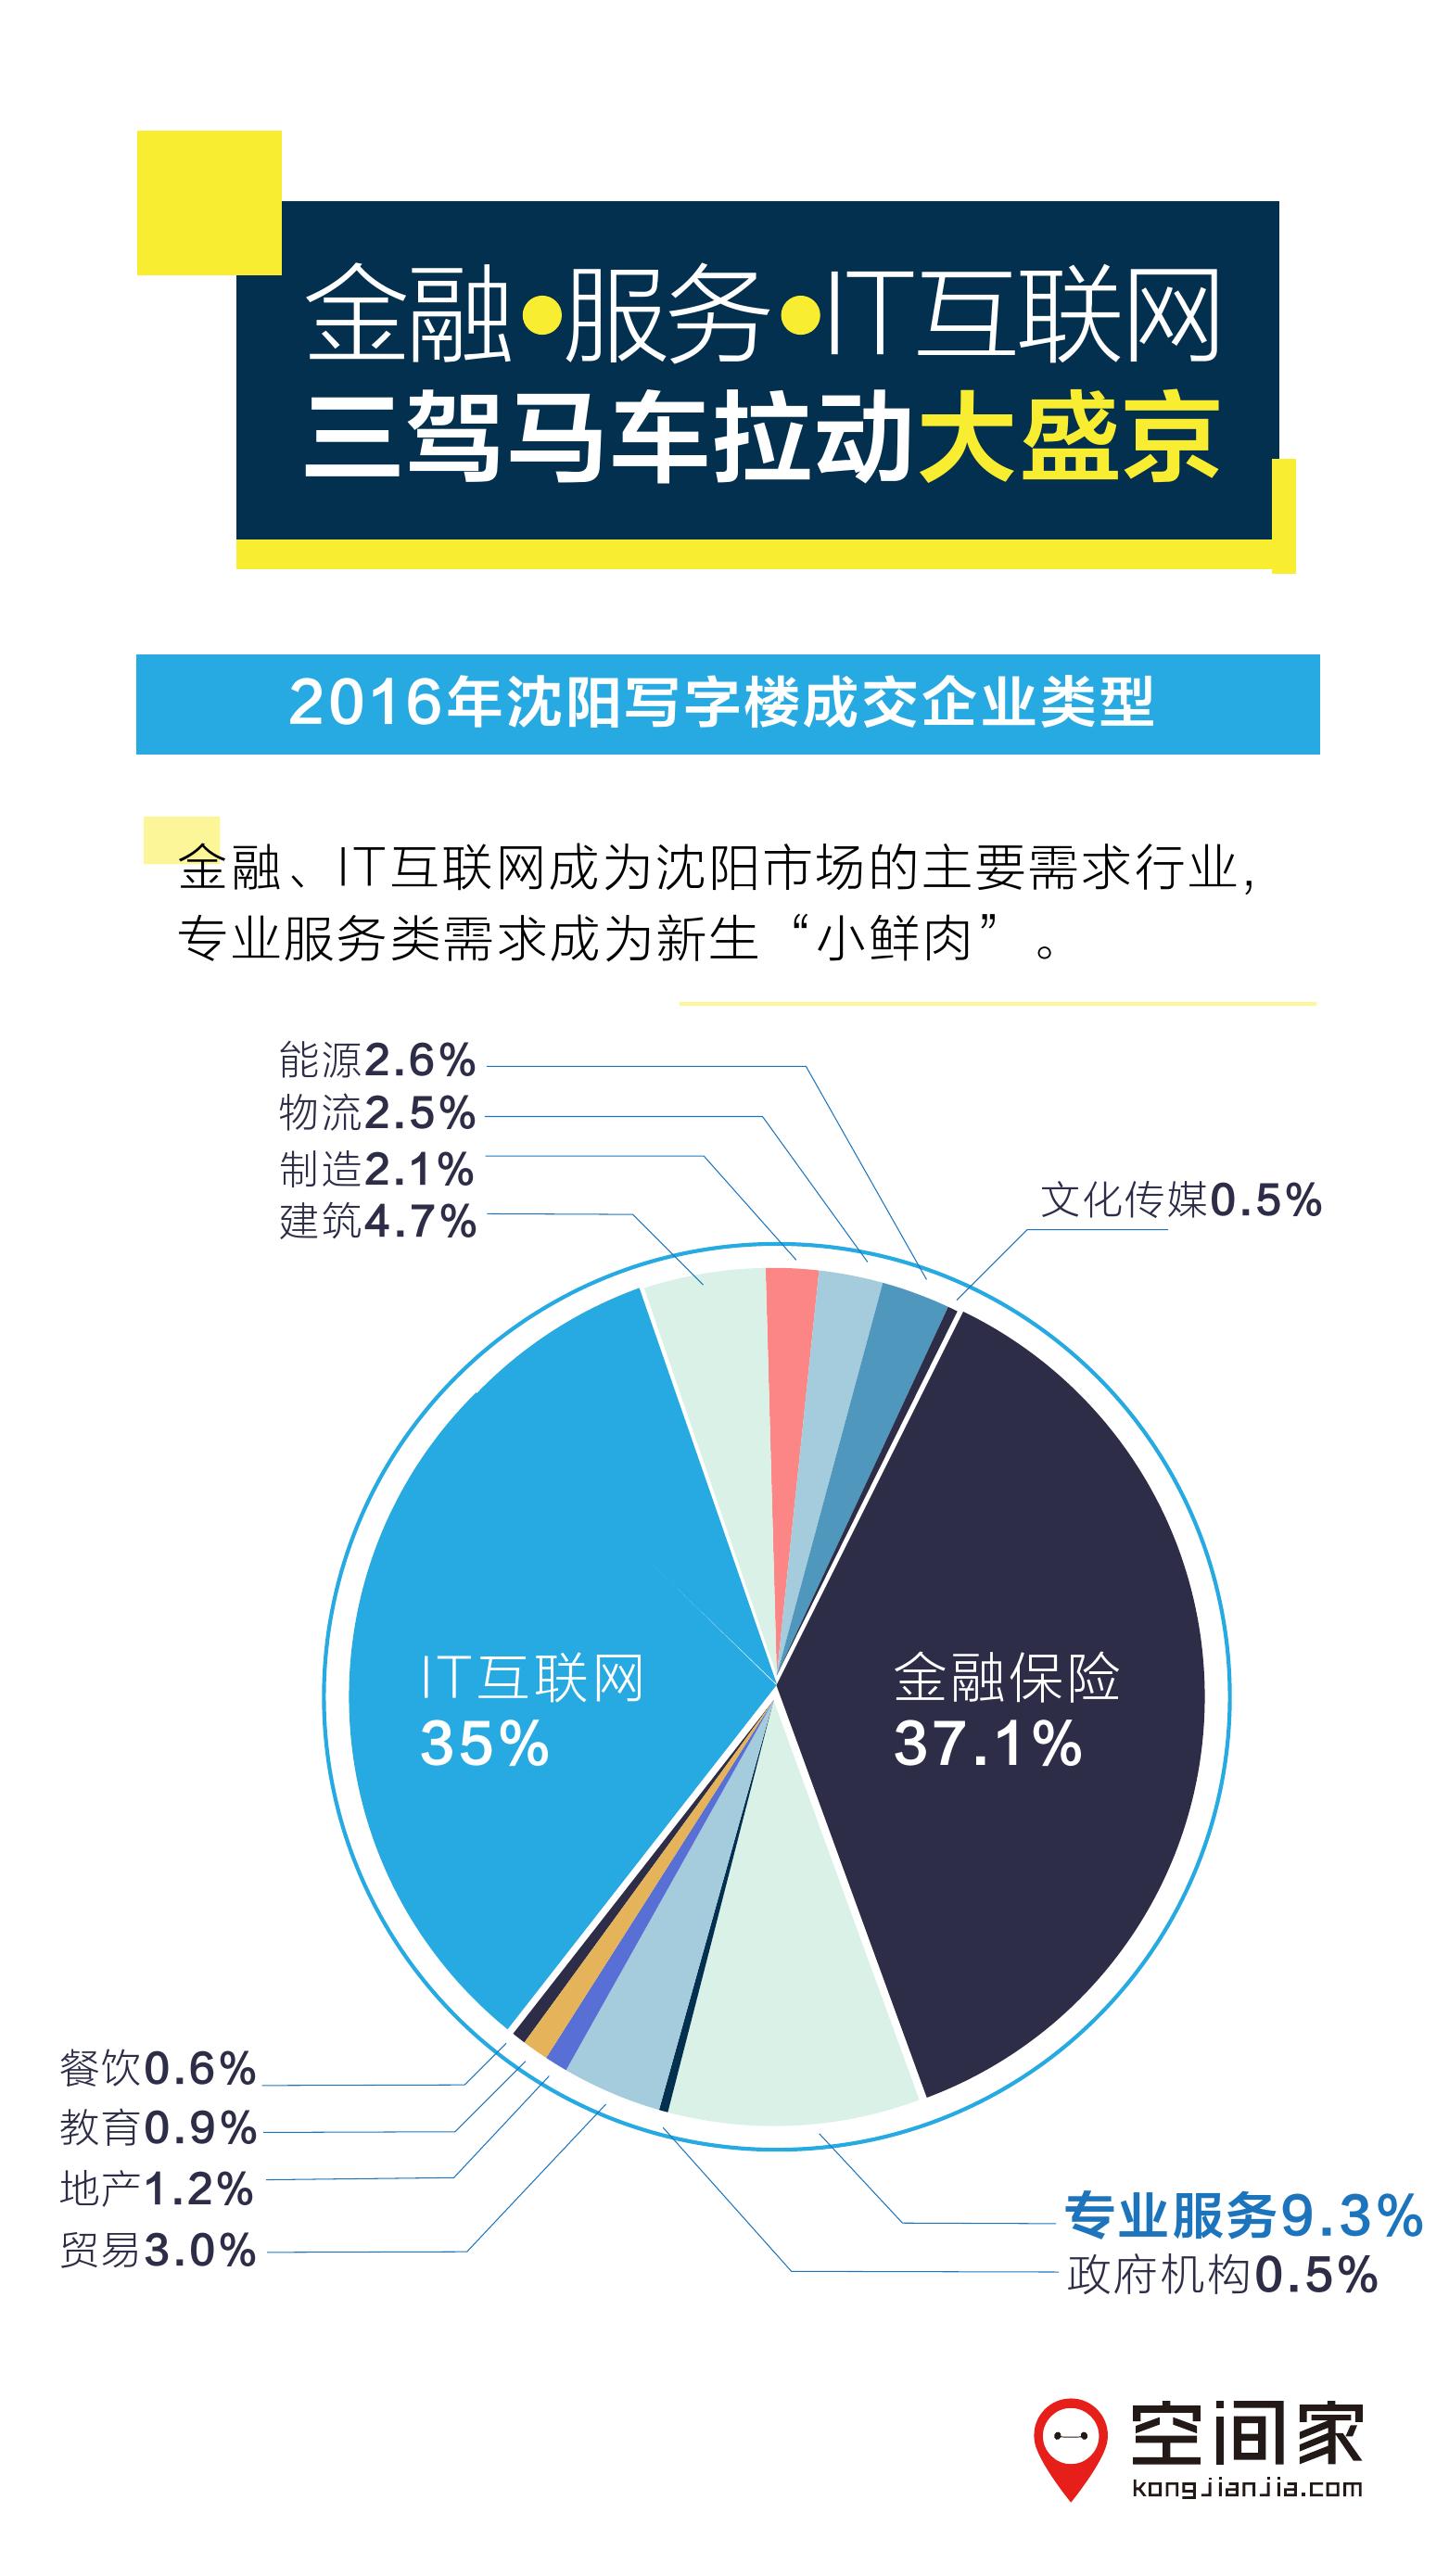 2016%e5%b9%b4%e6%b2%88%e9%98%b3%e5%86%99%e5%ad%97%e6%a5%bc%e5%b8%82%e5%9c%ba%e6%8a%a5%e5%91%8a_000006